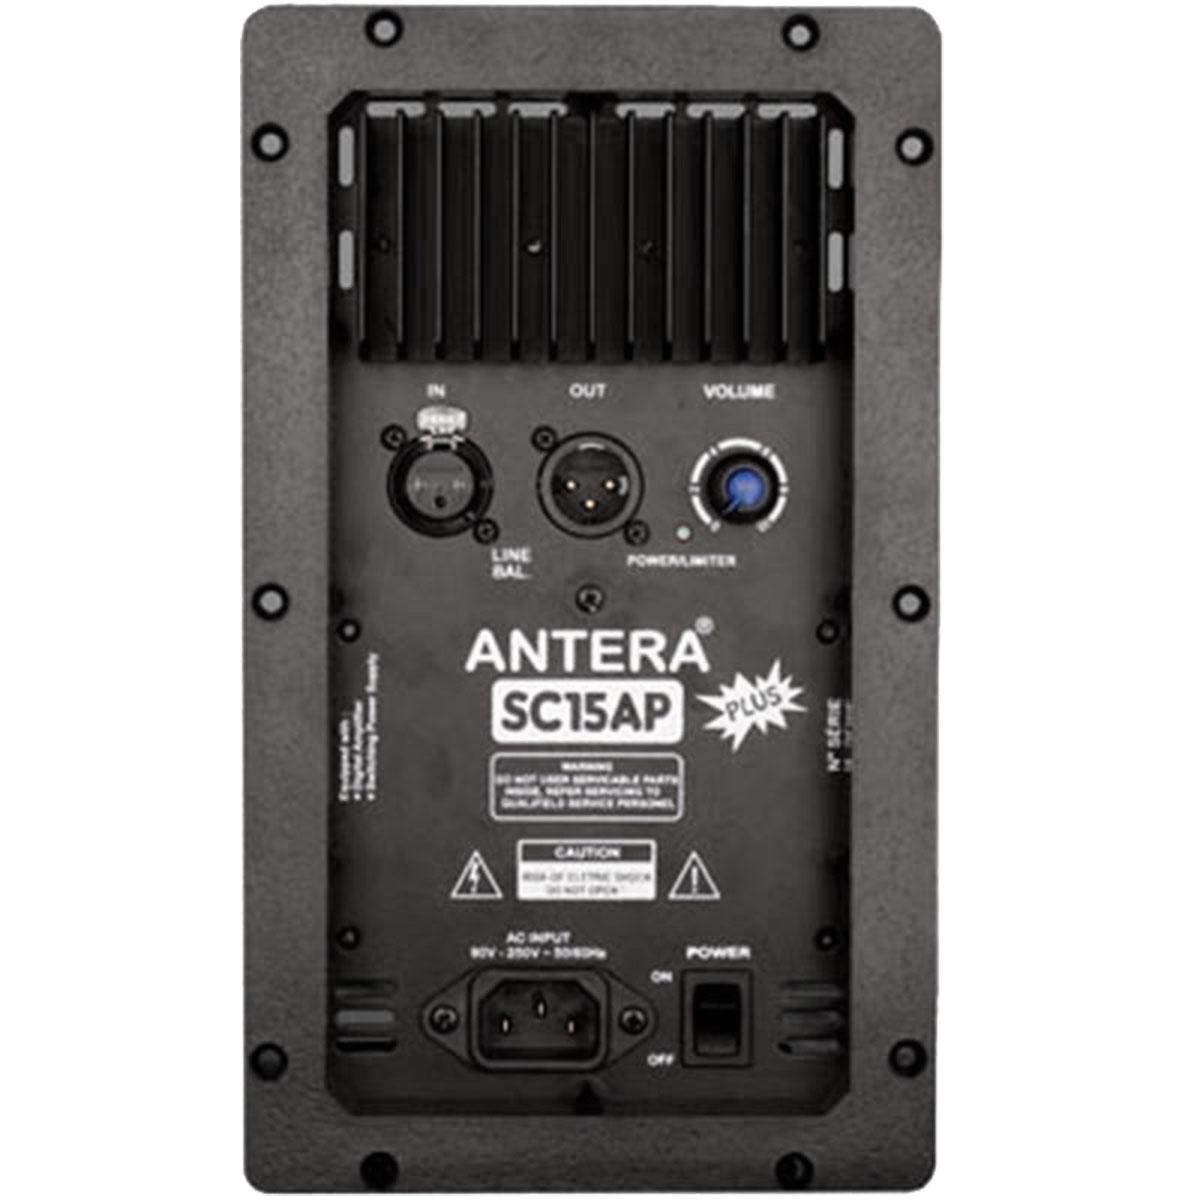 Caixa Ativa 200W SC 15 AP Plus Preta - Antera